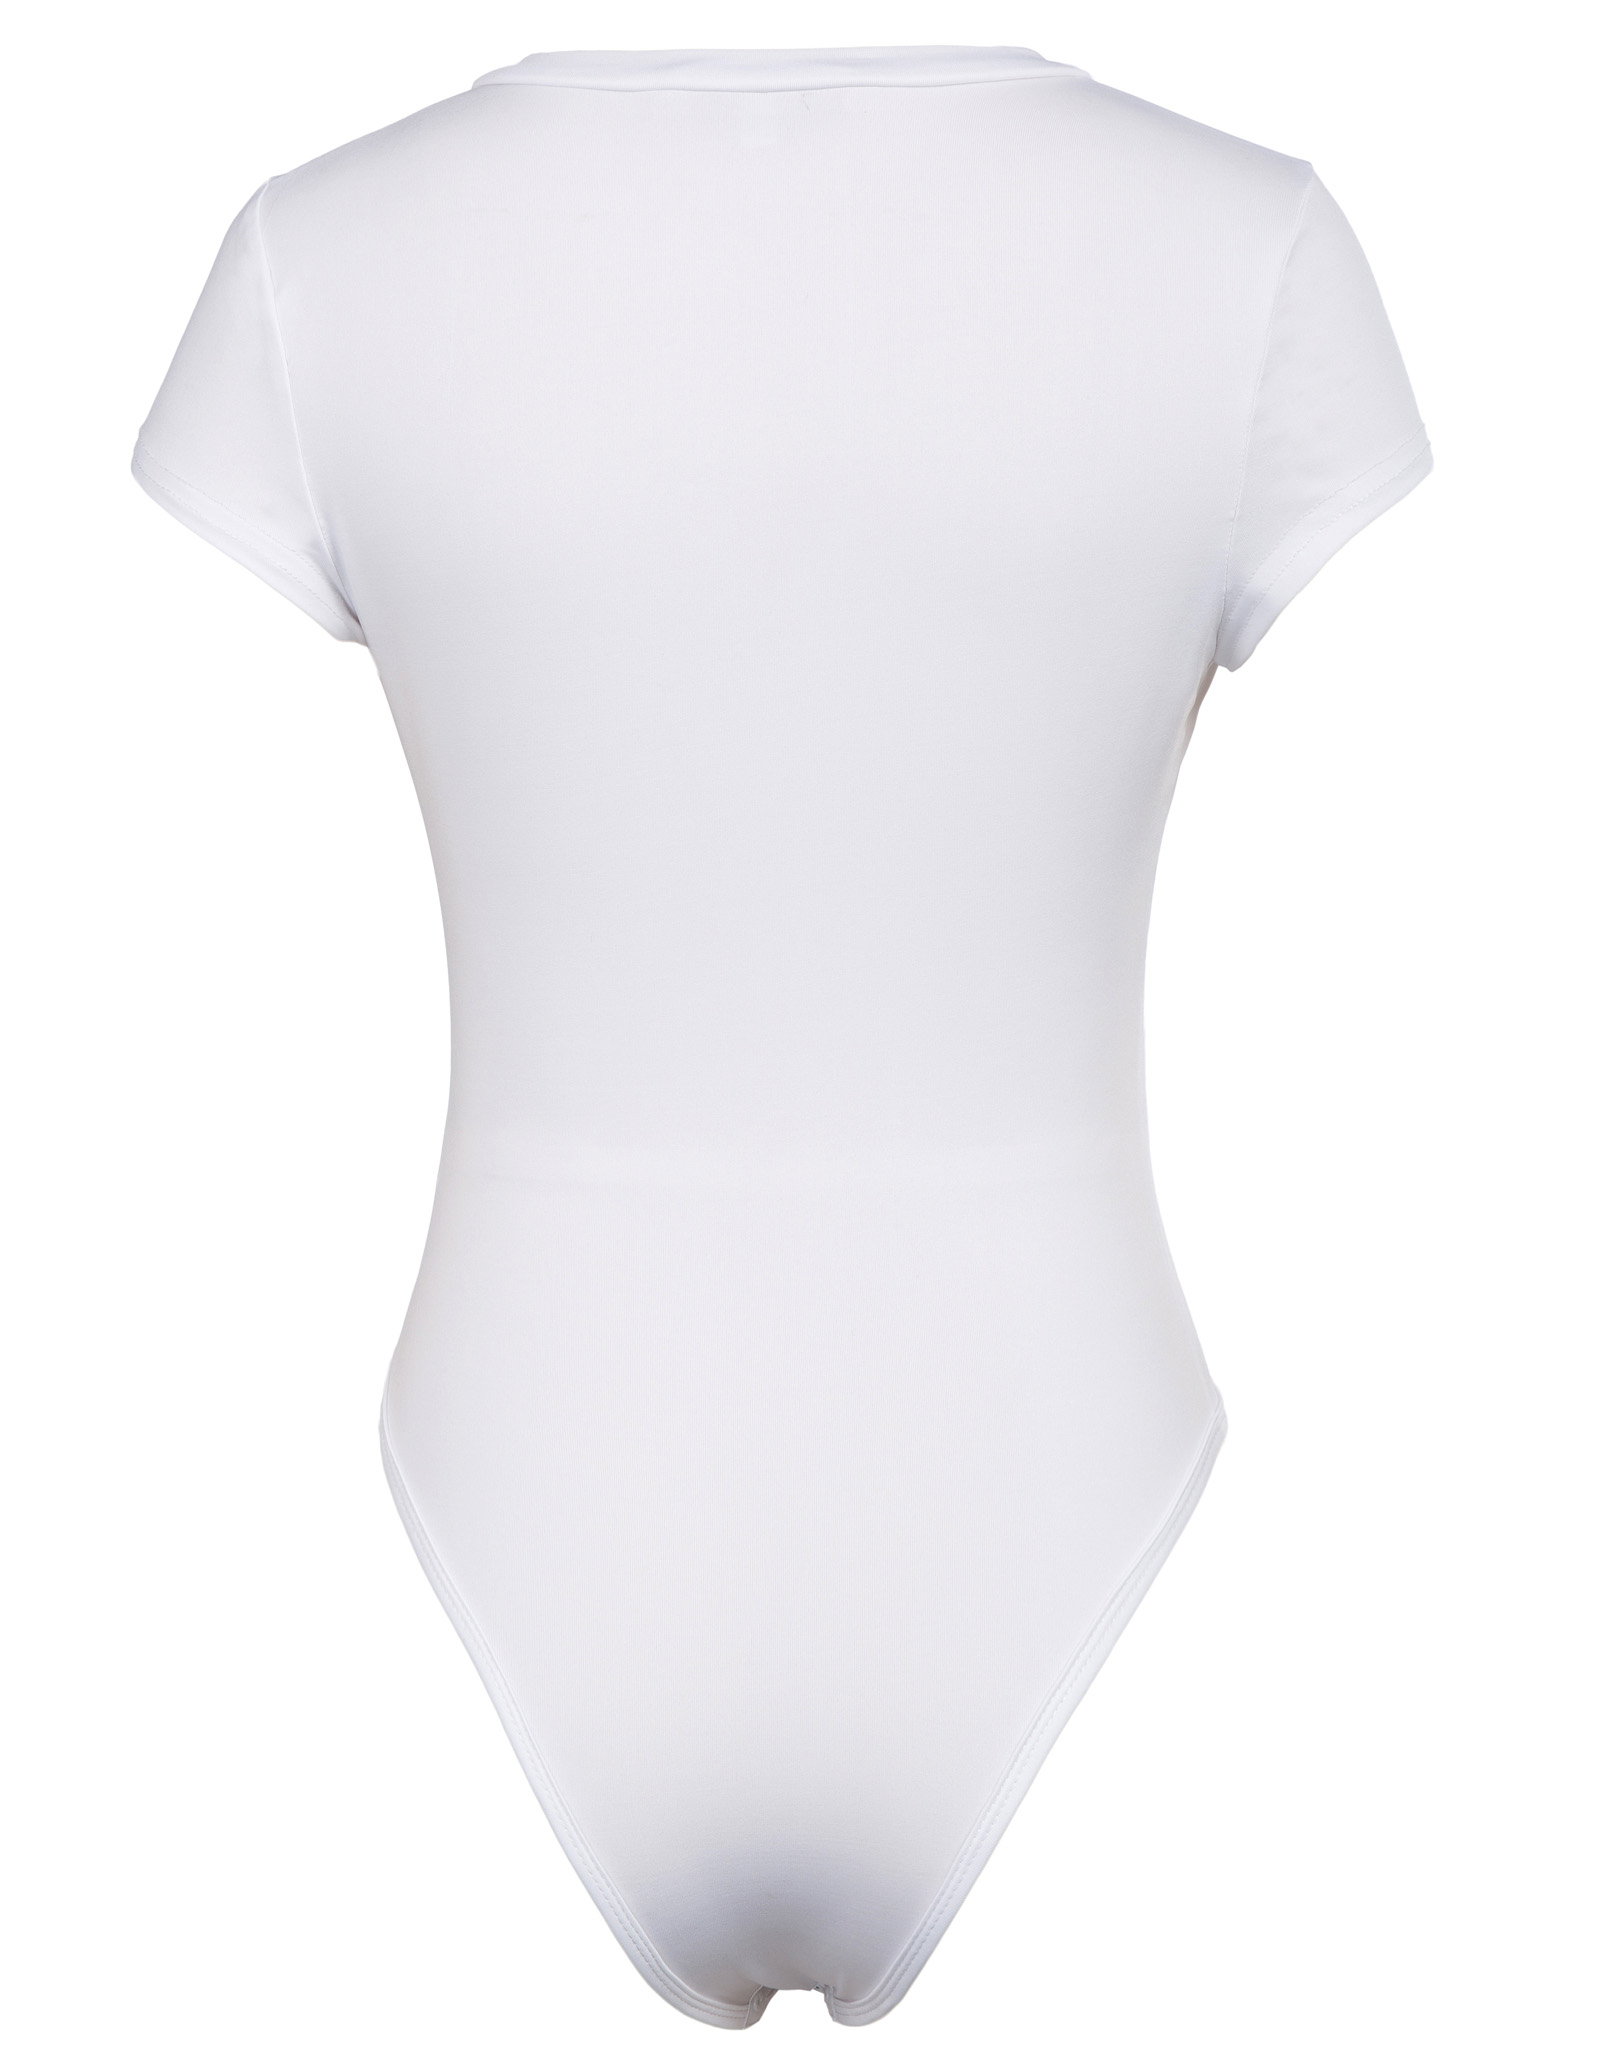 4cc45aa15bf9 2, Please allow slight (±2cm)manual measurement deviation for garment  length.